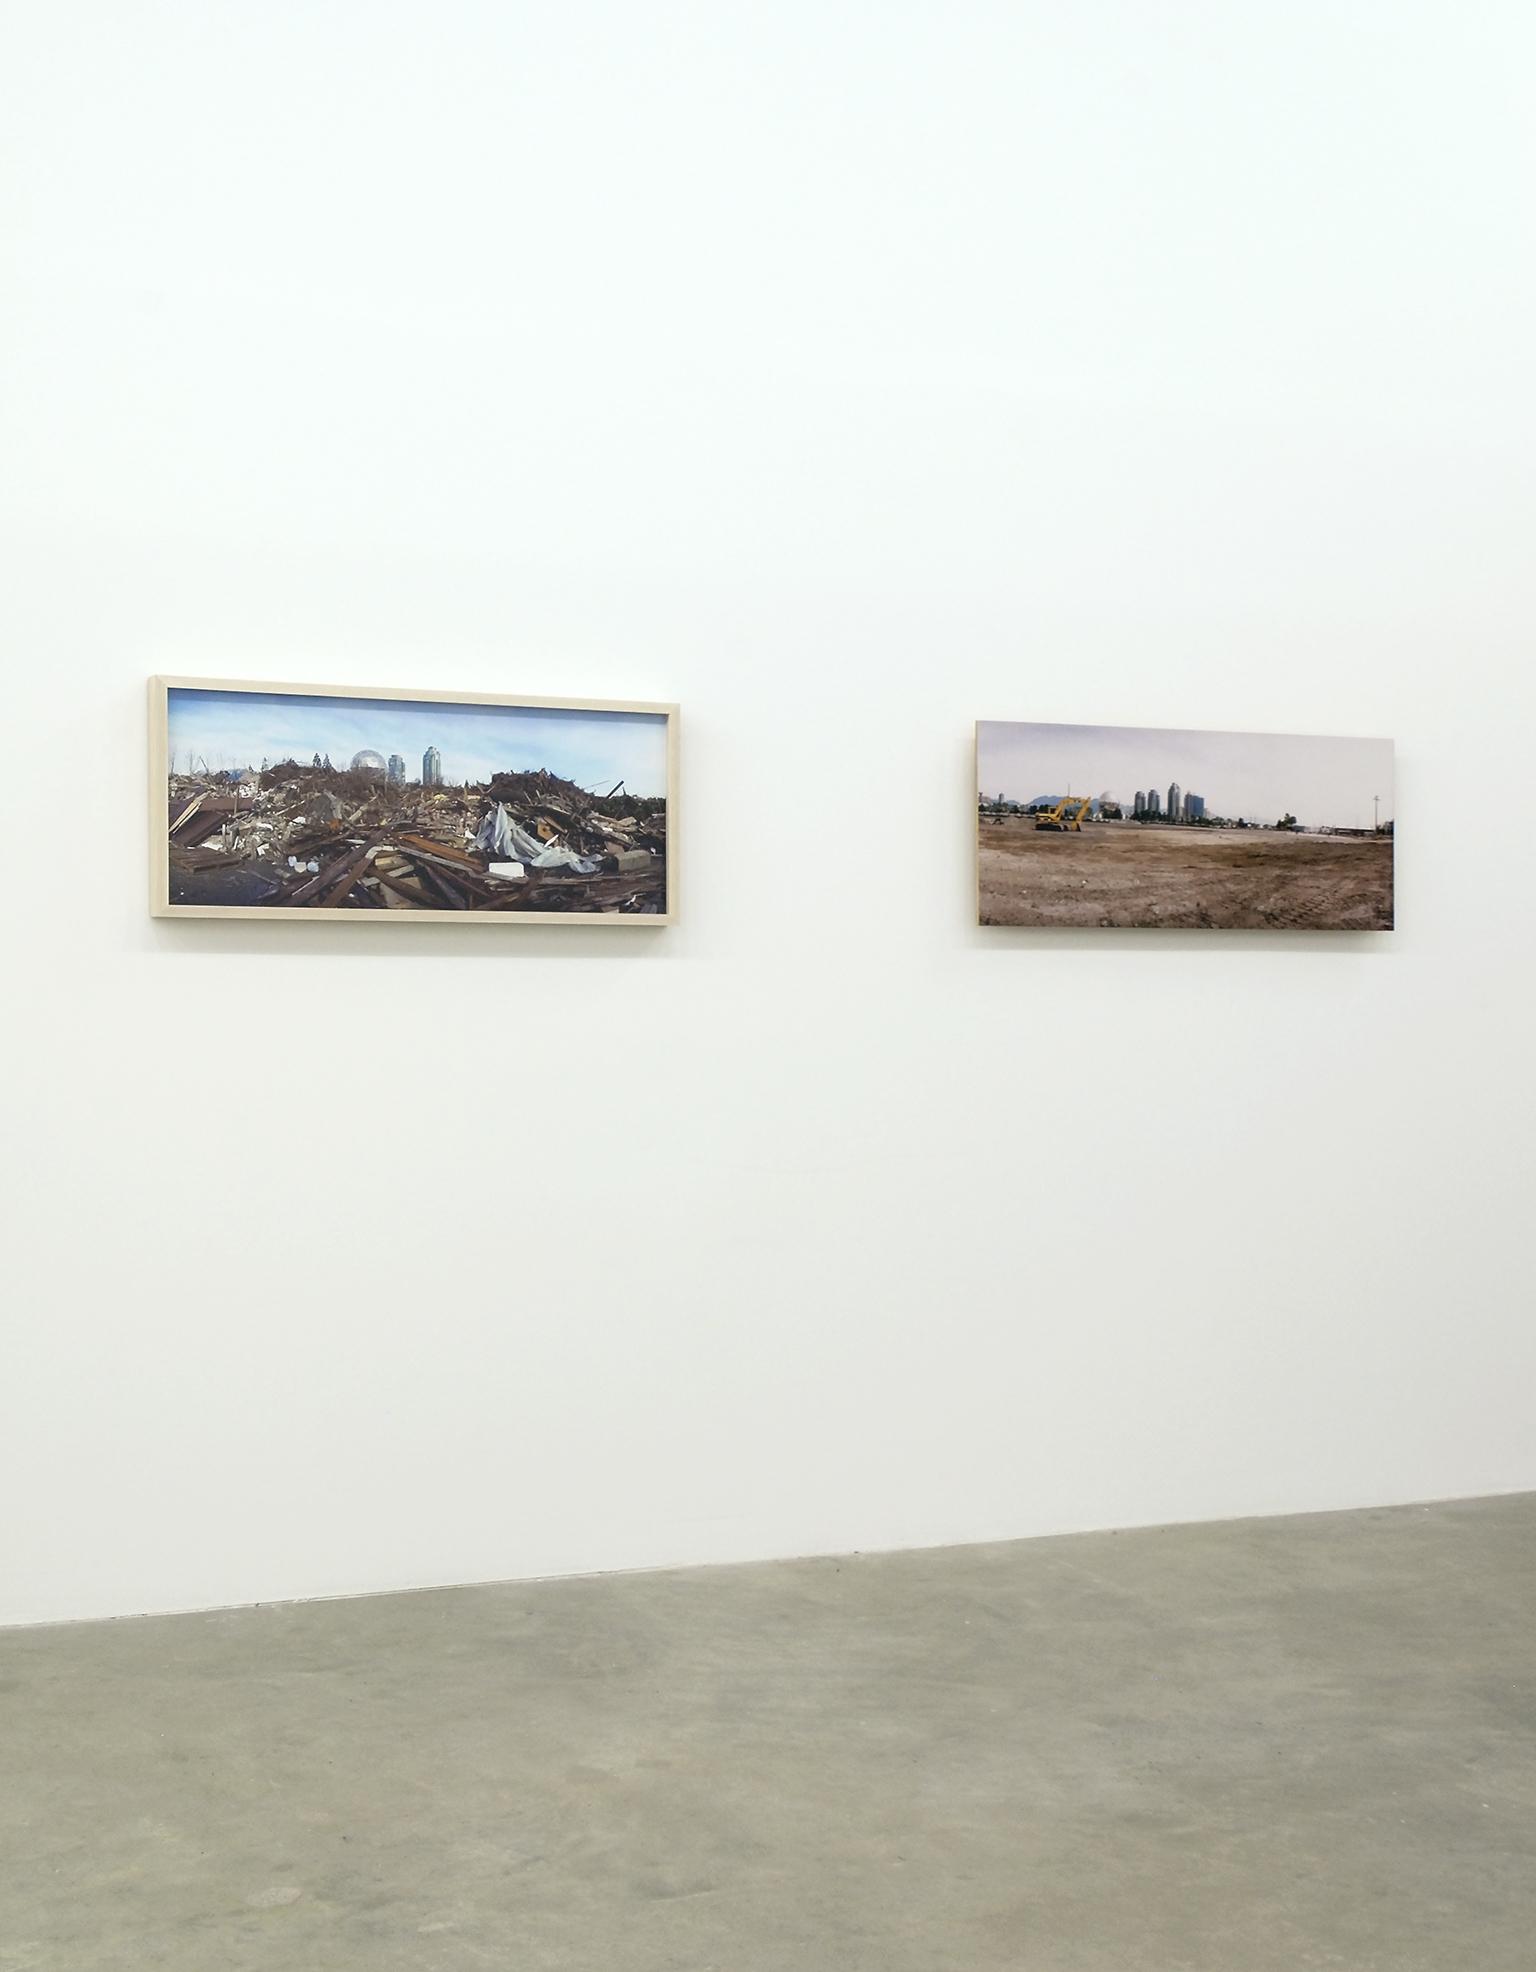 Christos Dikeakos, installation view, Catriona Jeffries, 2009 by